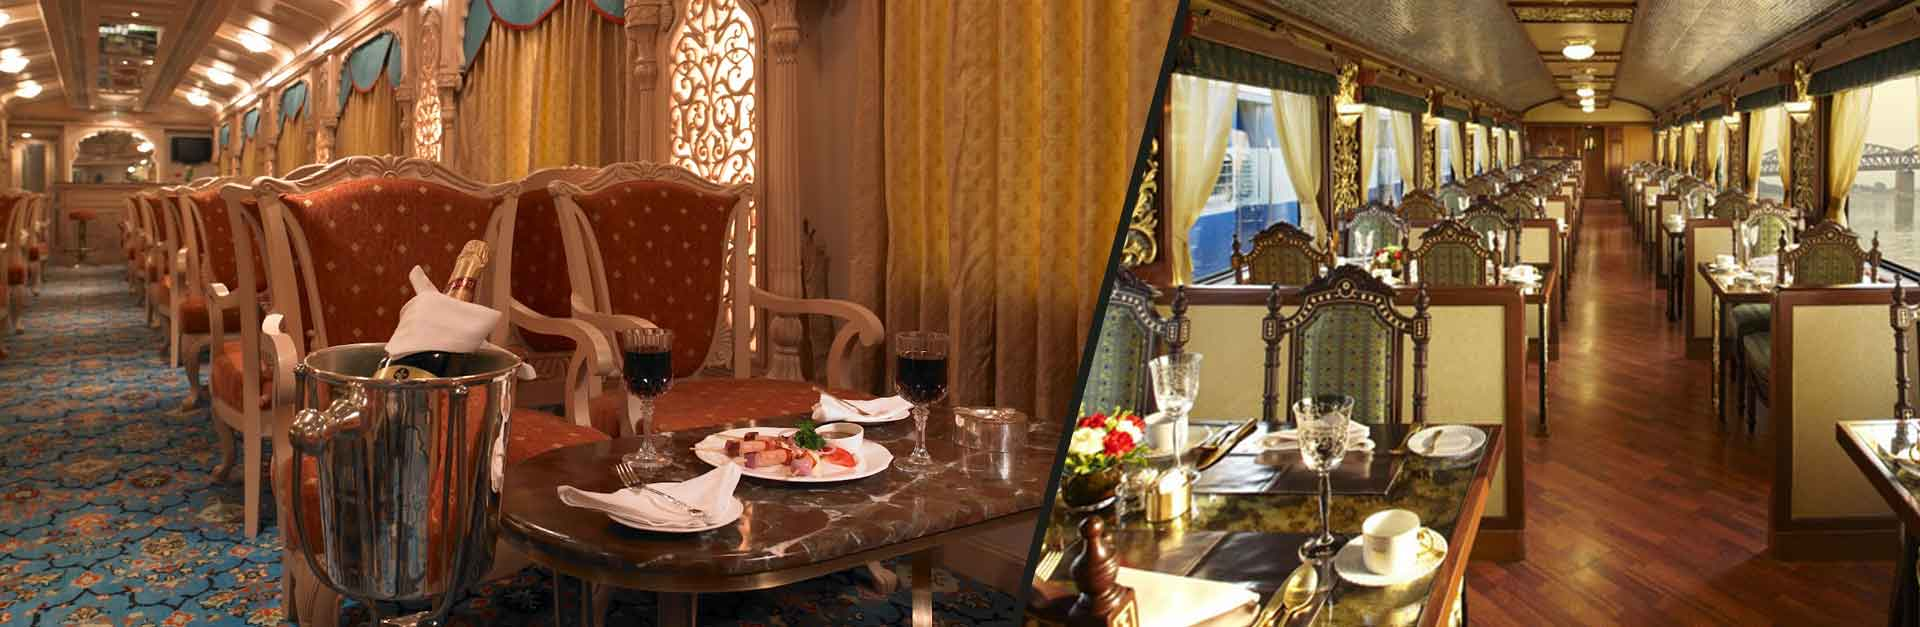 royal rajasthan on wheels train fare